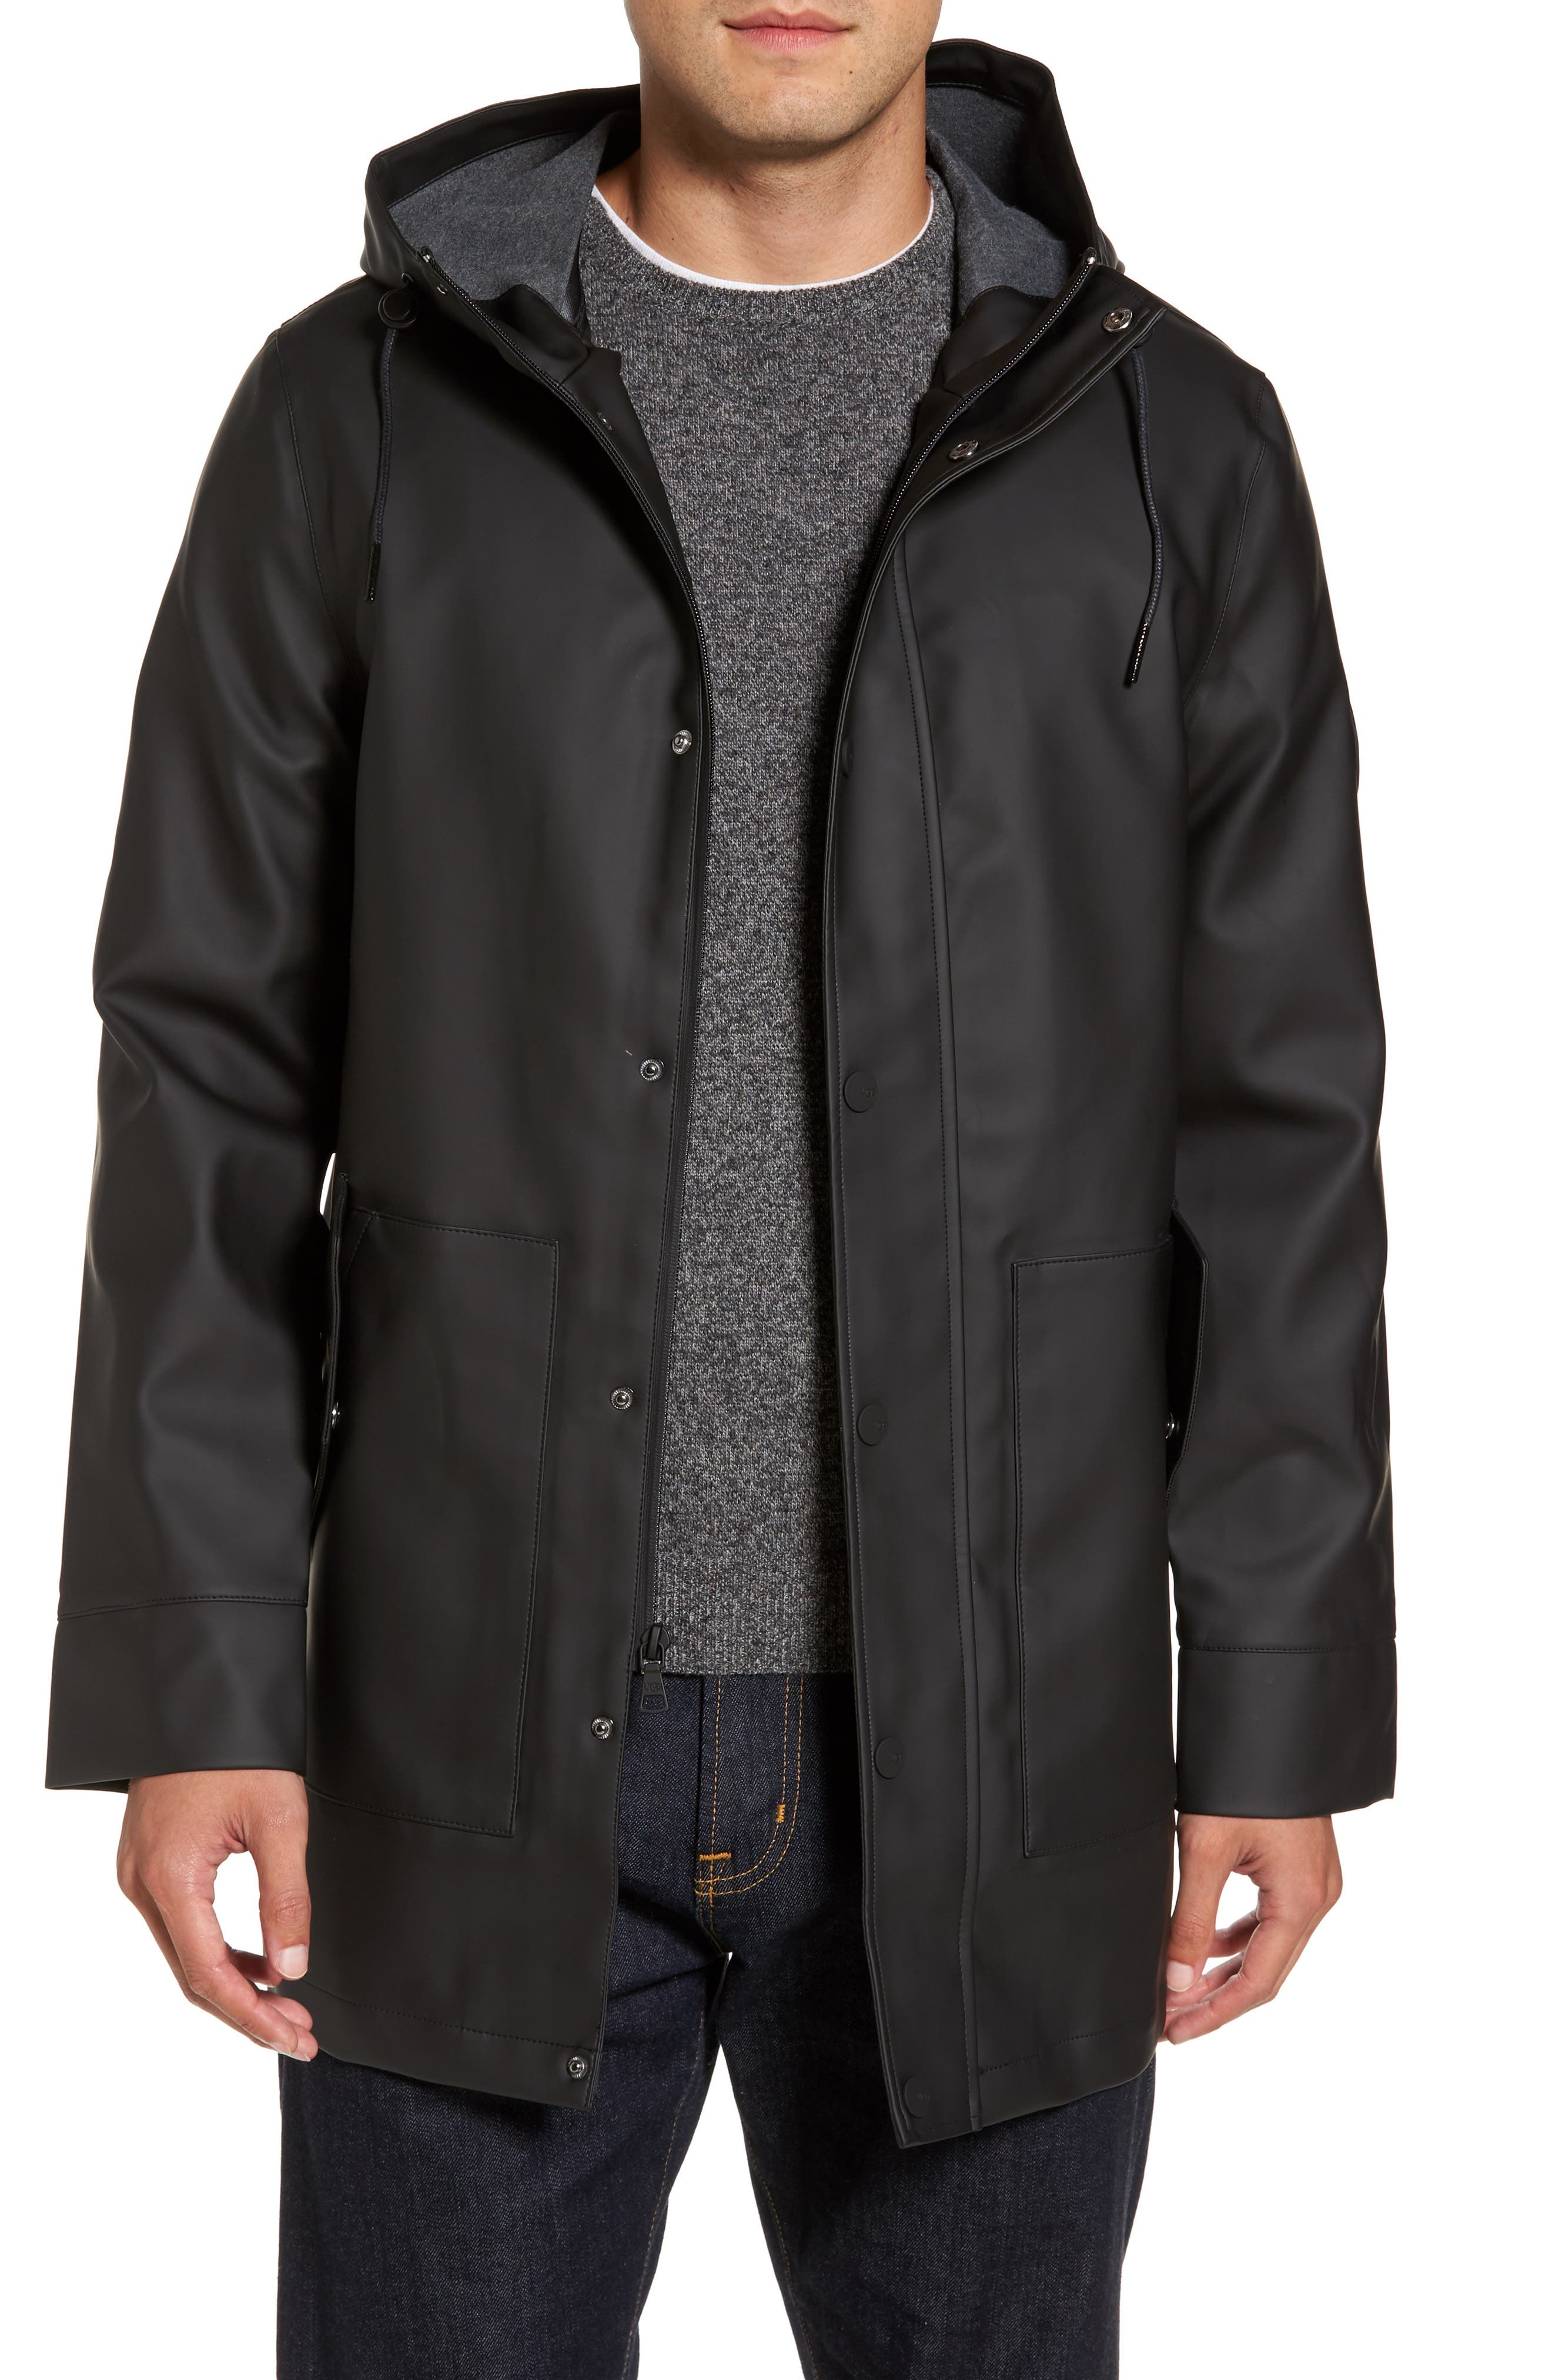 UGG<SUP>®</SUP> Hooded Raincoat, Main, color, 001